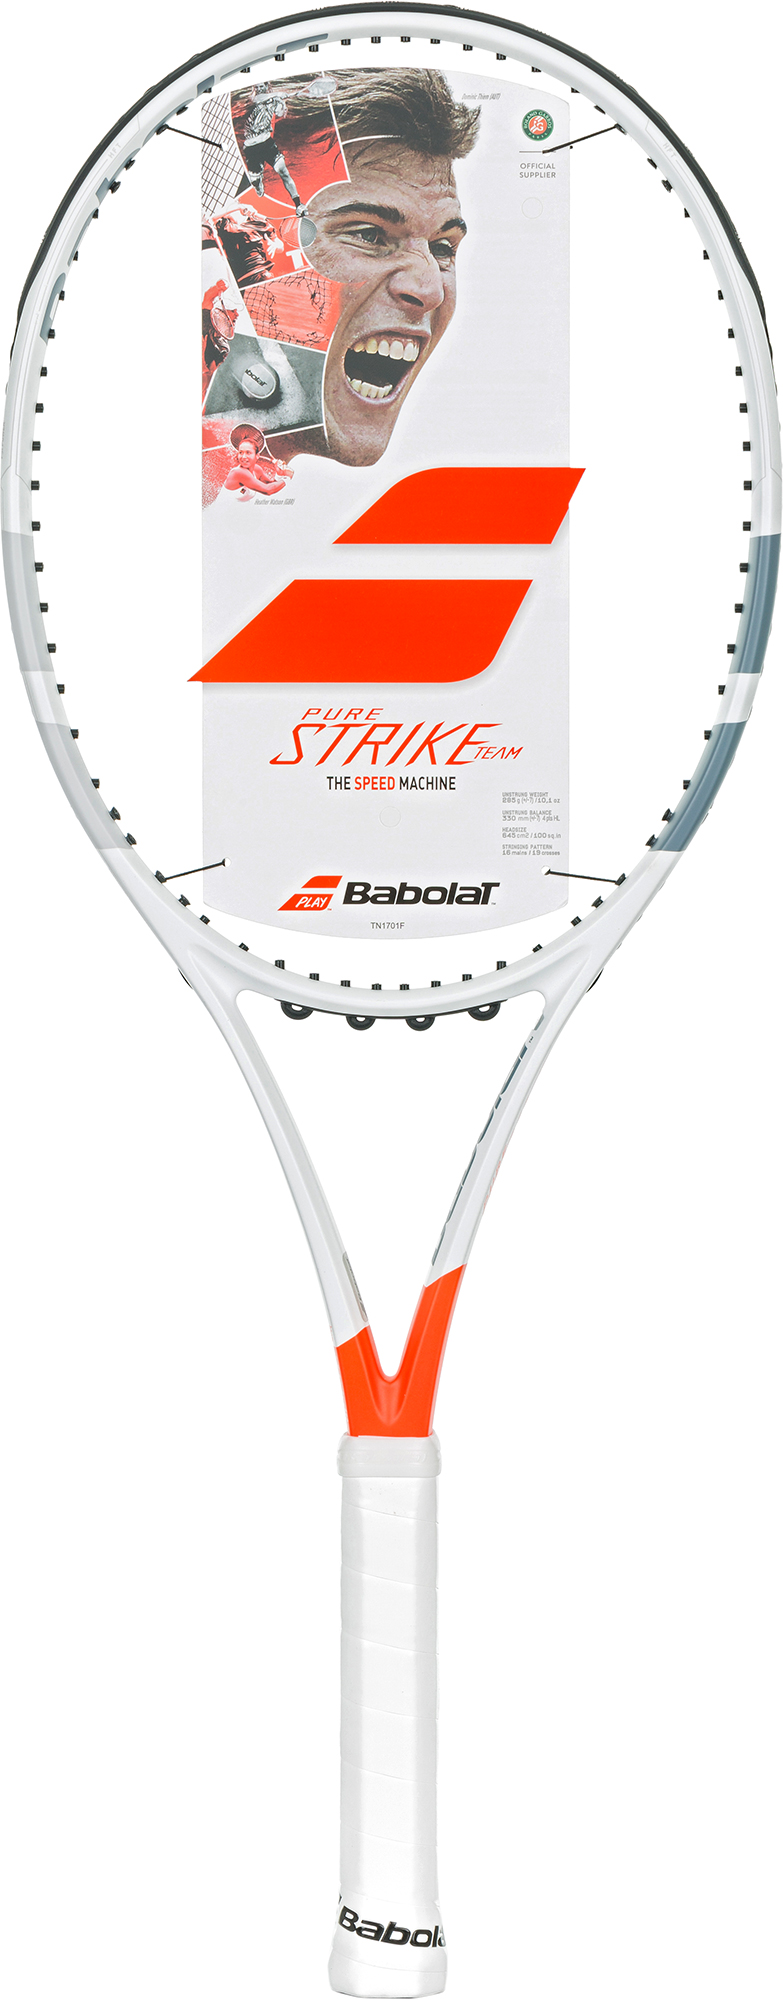 Babolat Ракетка для большого тенниса Babolat Pure Strike Team Unstrung babolat кроссовки женские babolat propulse team all court